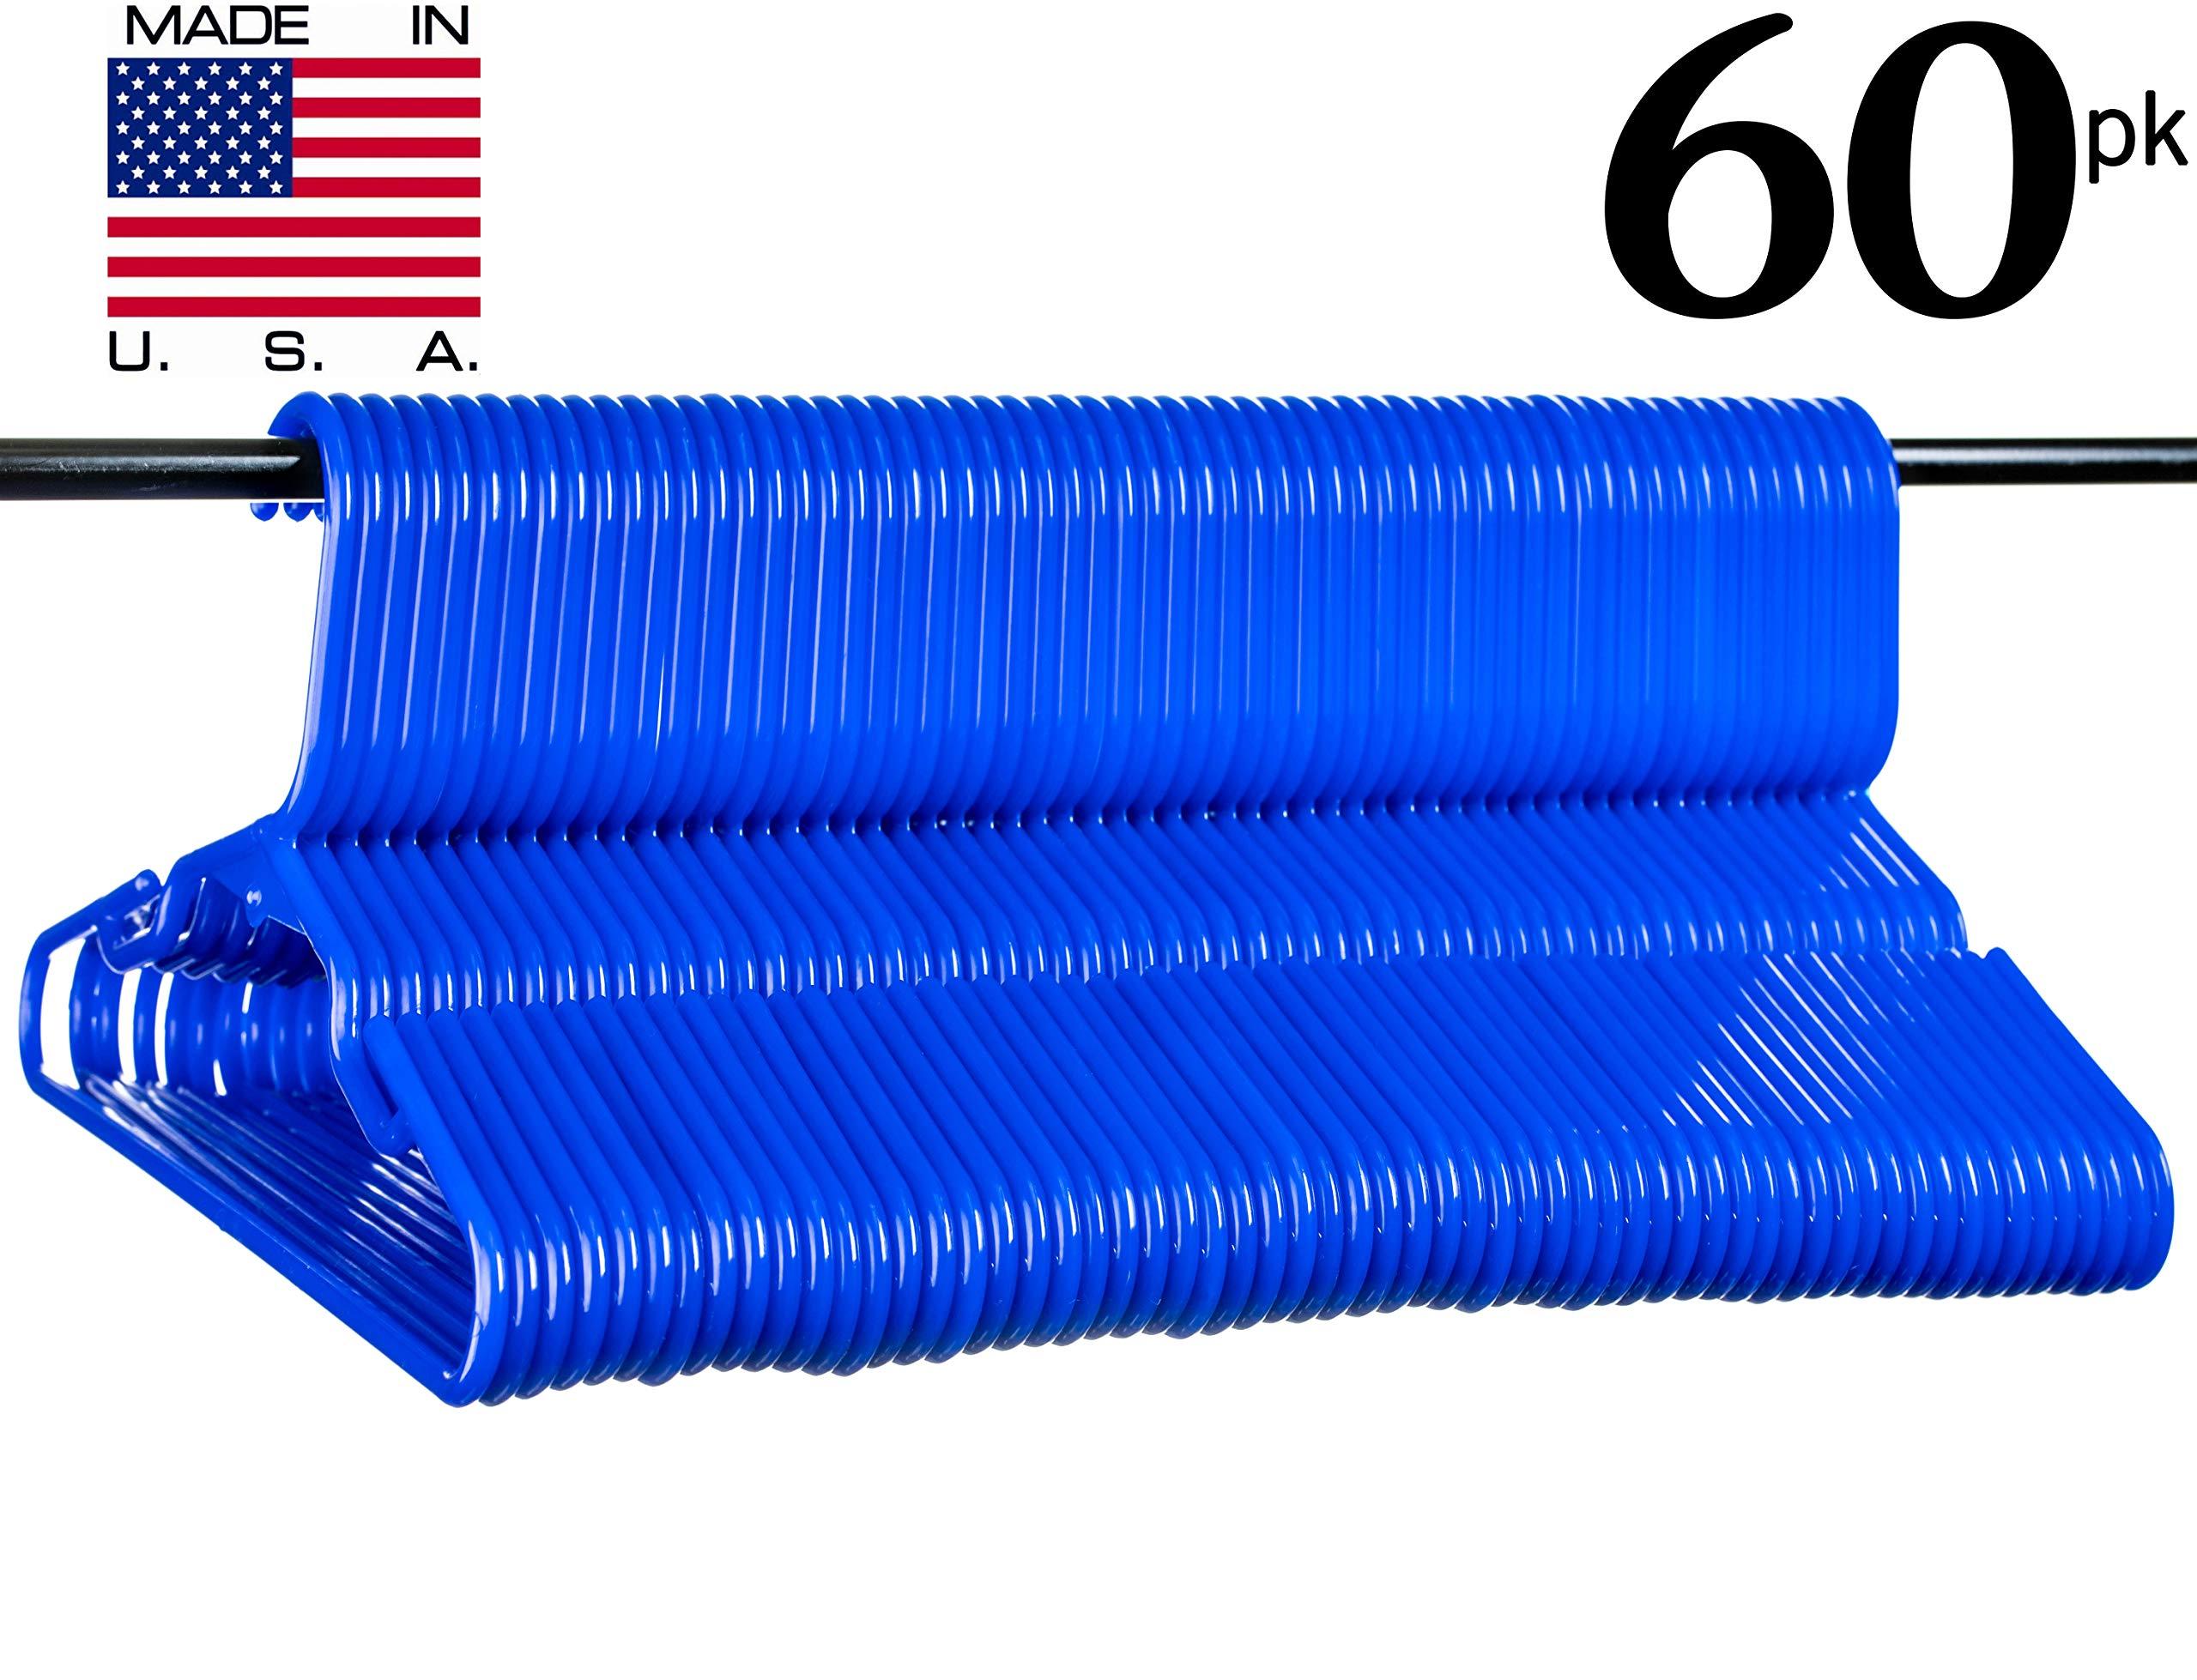 Neaties USA Made Children's Small Blue Plastic Hangers, 60pk by Neaties